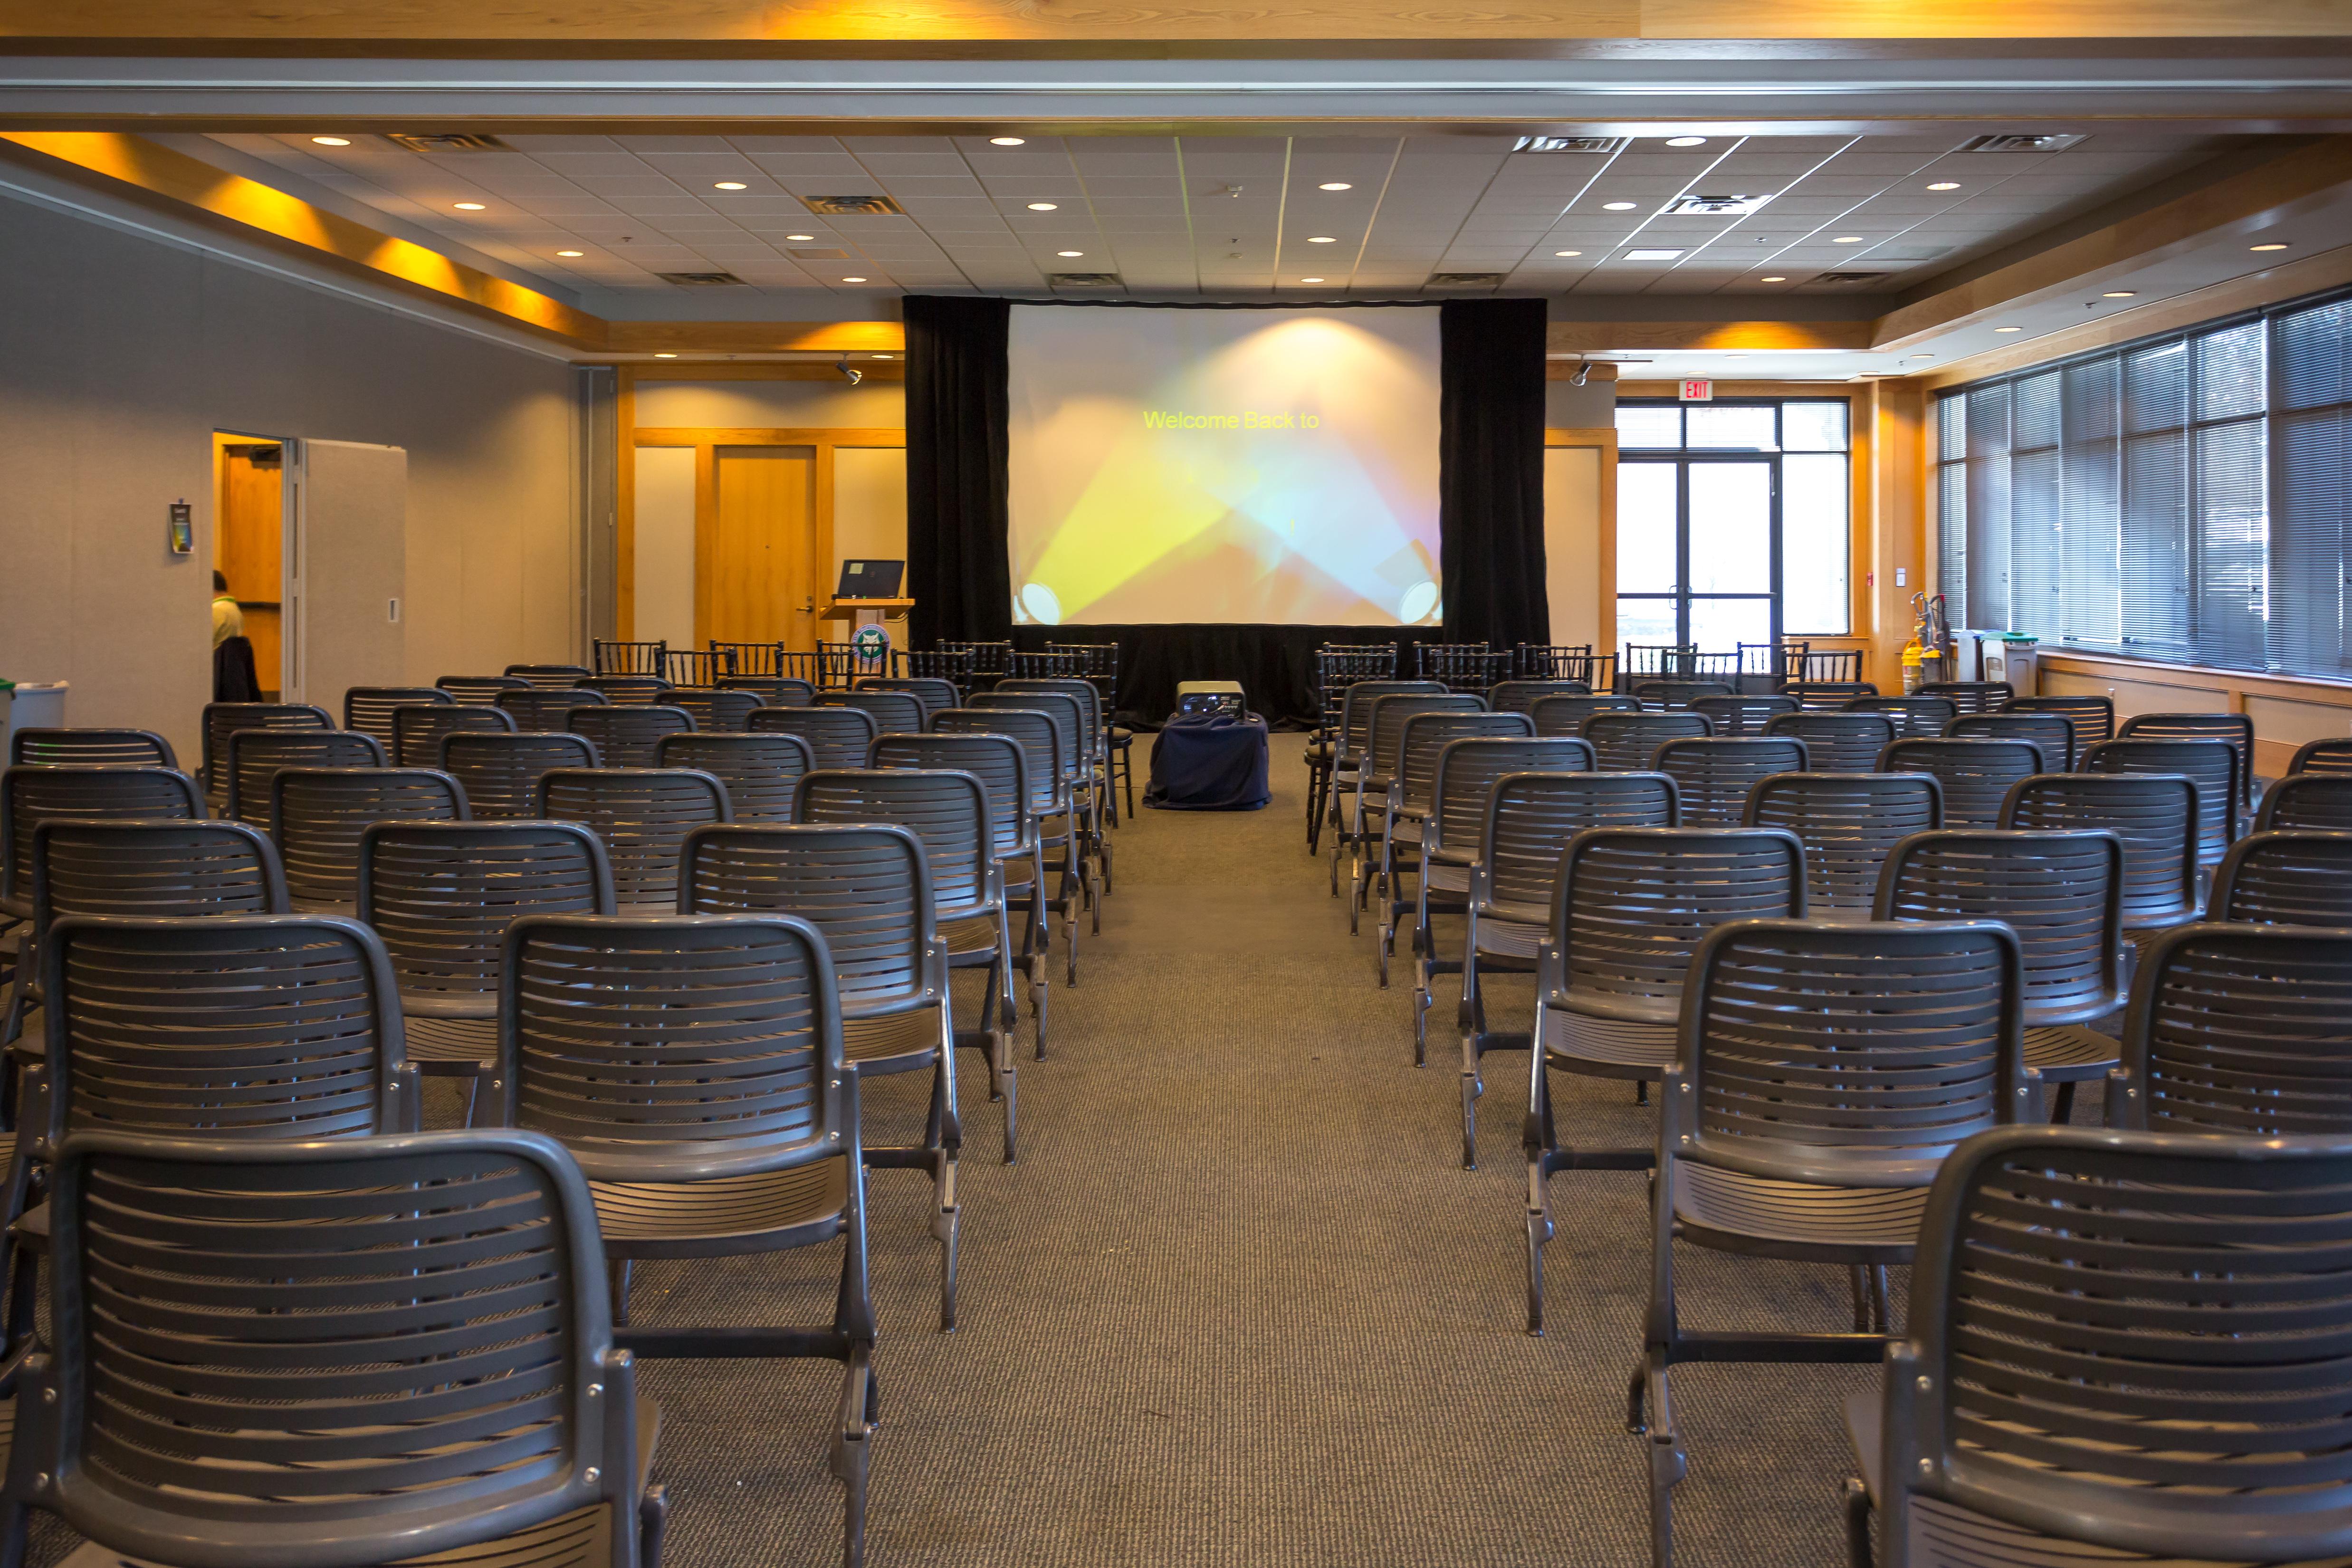 Education Hall Meeting5 B 14E1 4E2A B3ACB37E693AAD72 842fc252 d0f4 4c21 9ac afc3a